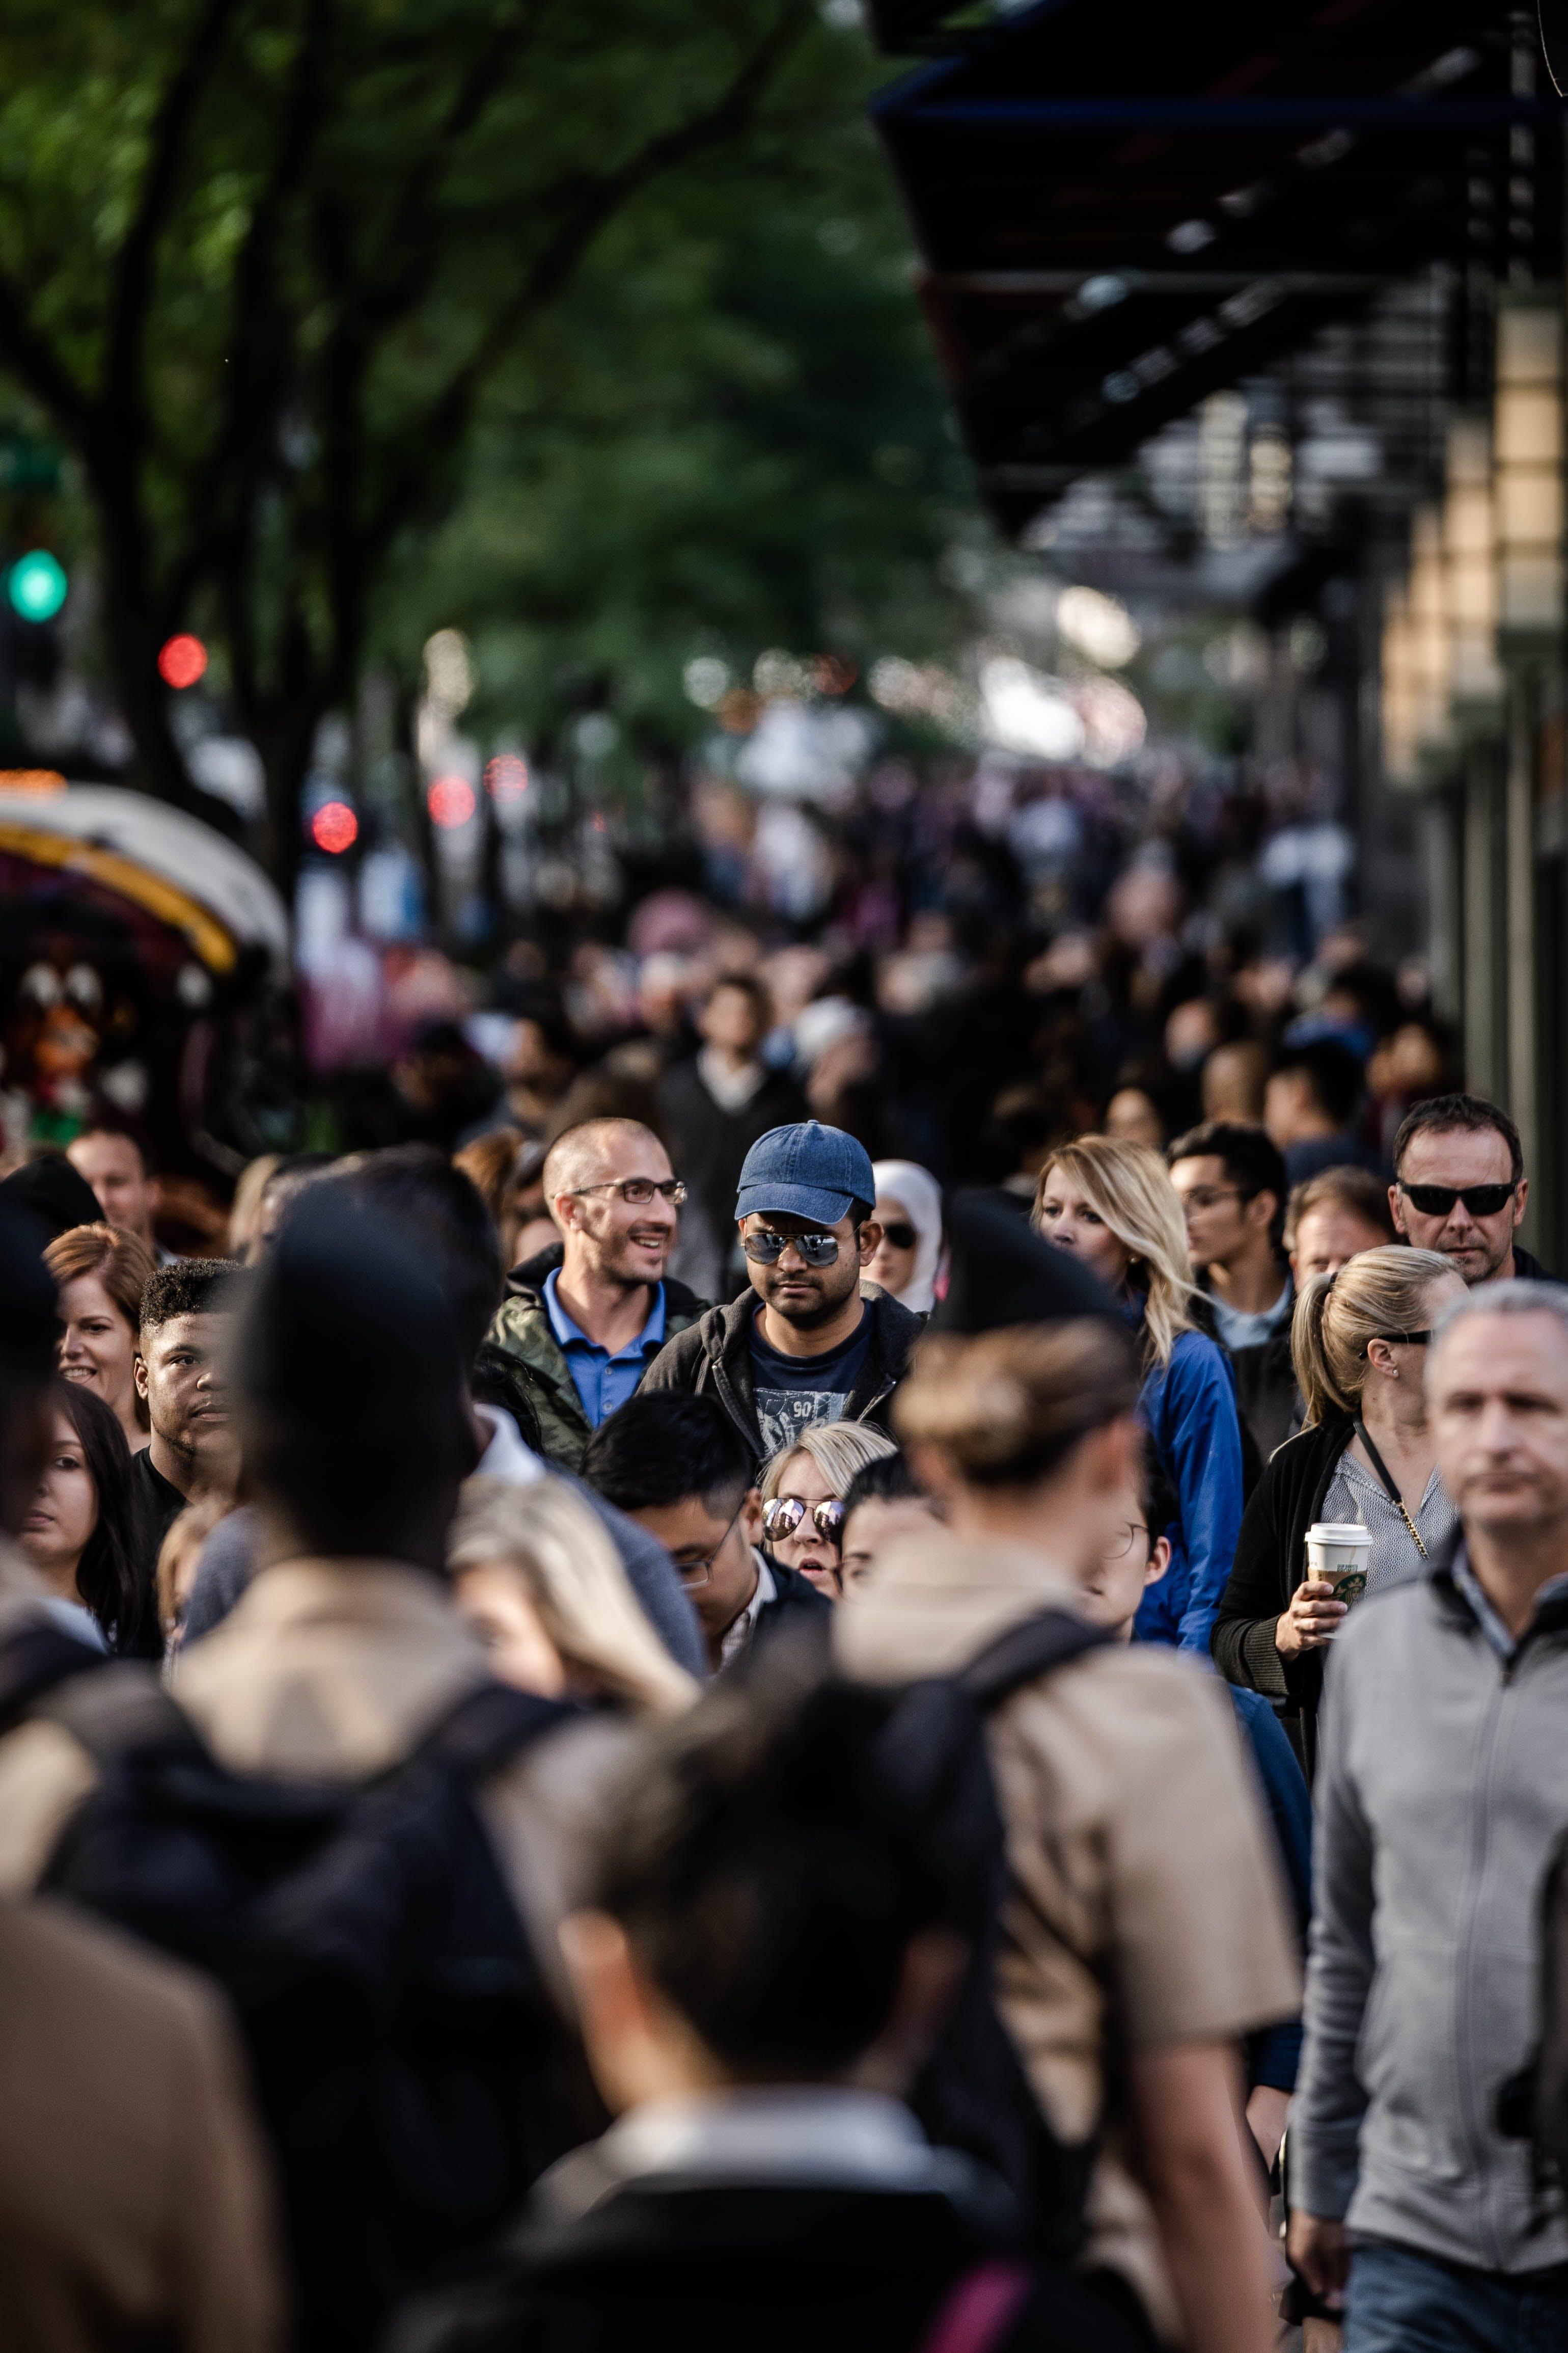 Foto stok gratis berjalan, jalan yang sibuk, kerumunan orang, manusia